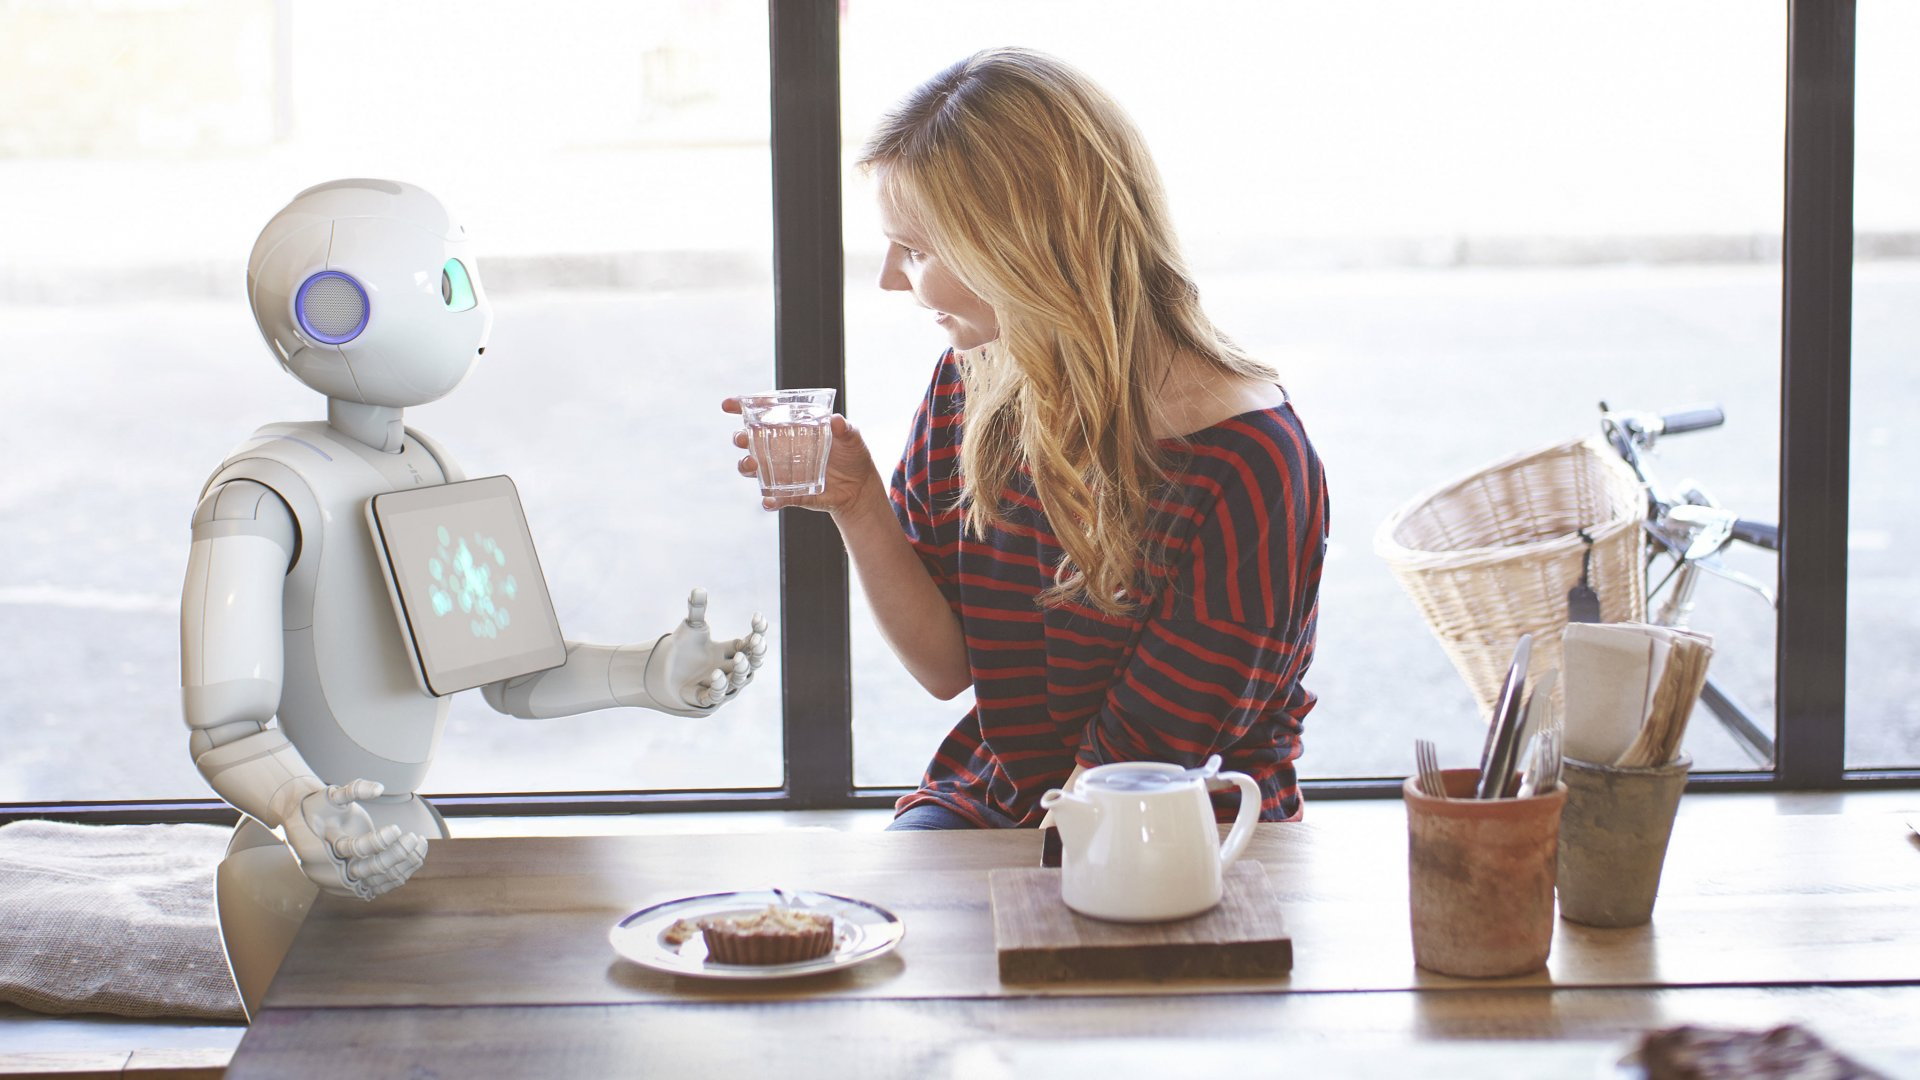 Aldebaran's humanoid robot, Pepper.